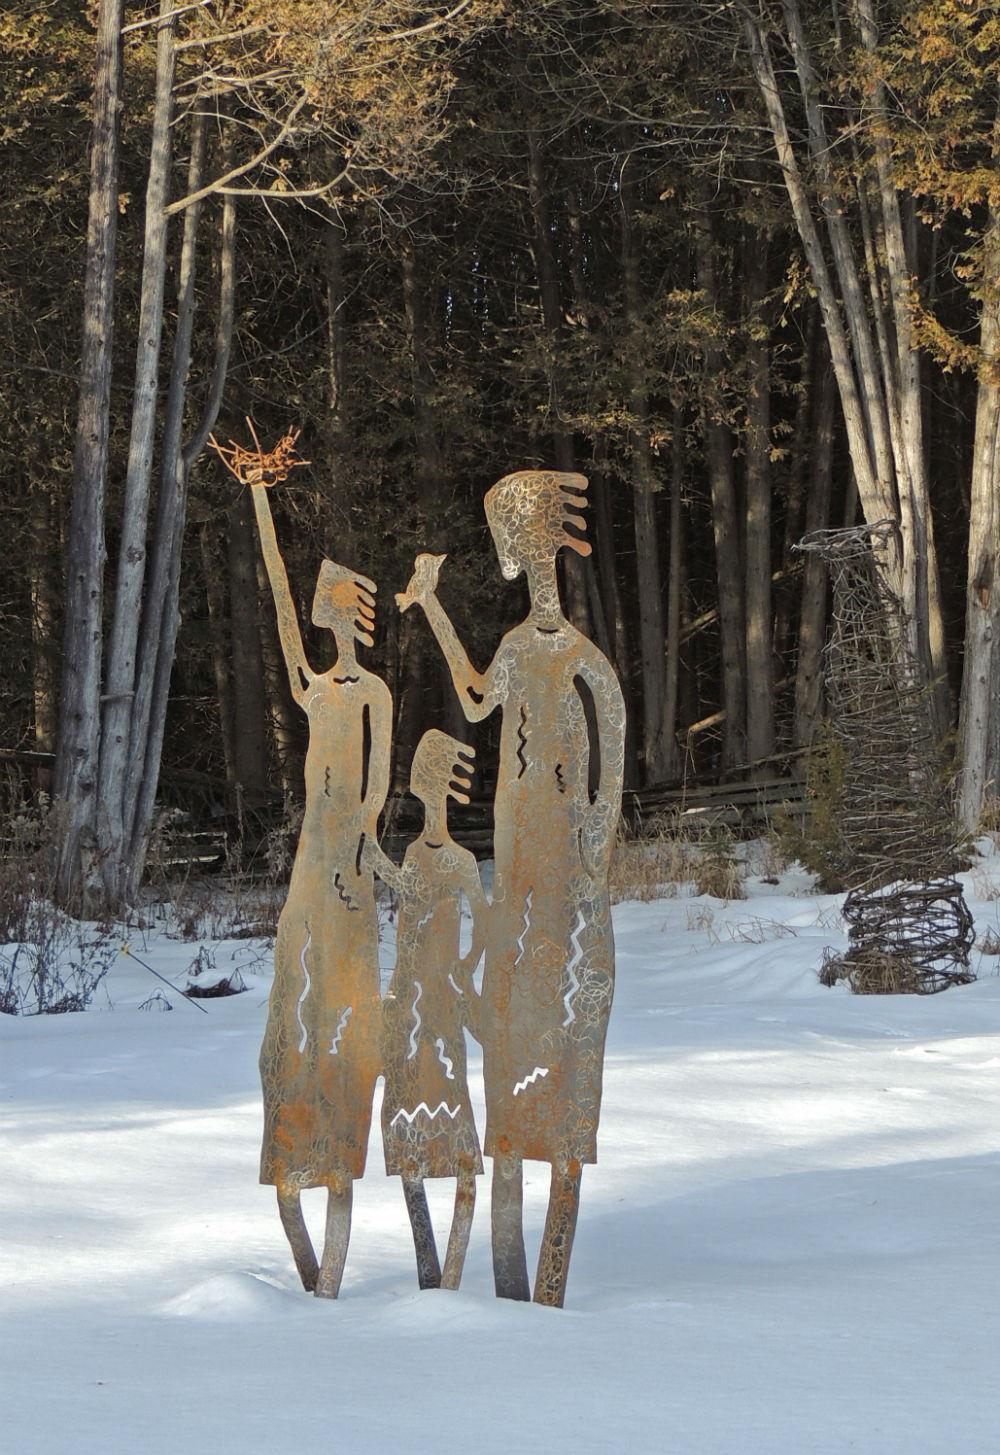 David Hickeynest sculpture_opt.jpg